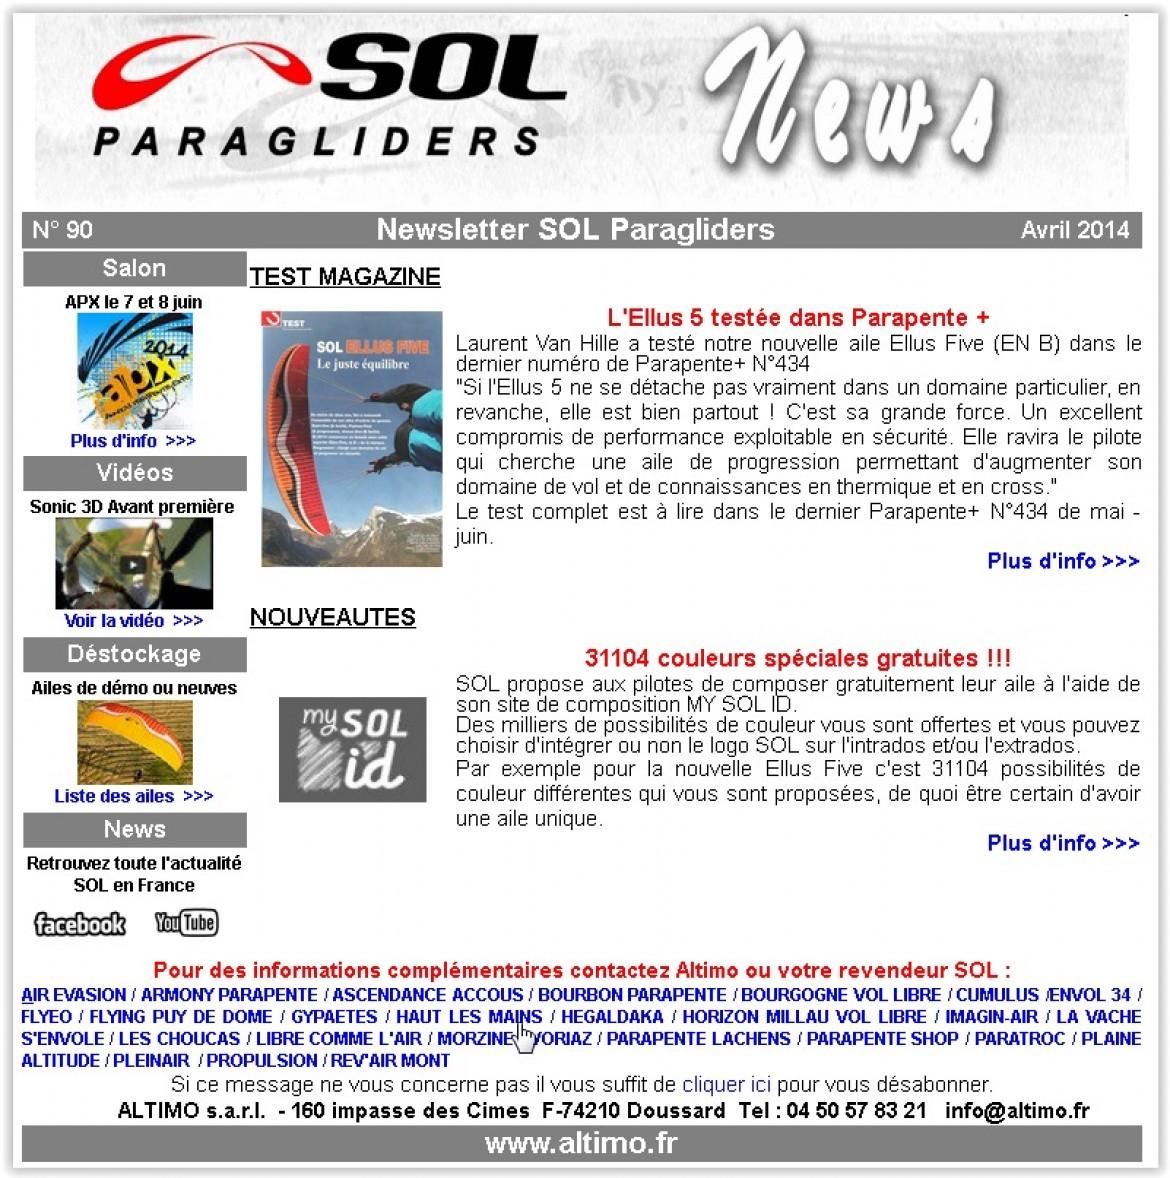 Parapentes SOL PARAGLIDERS : les news d'ALTIMO (avril 2014)